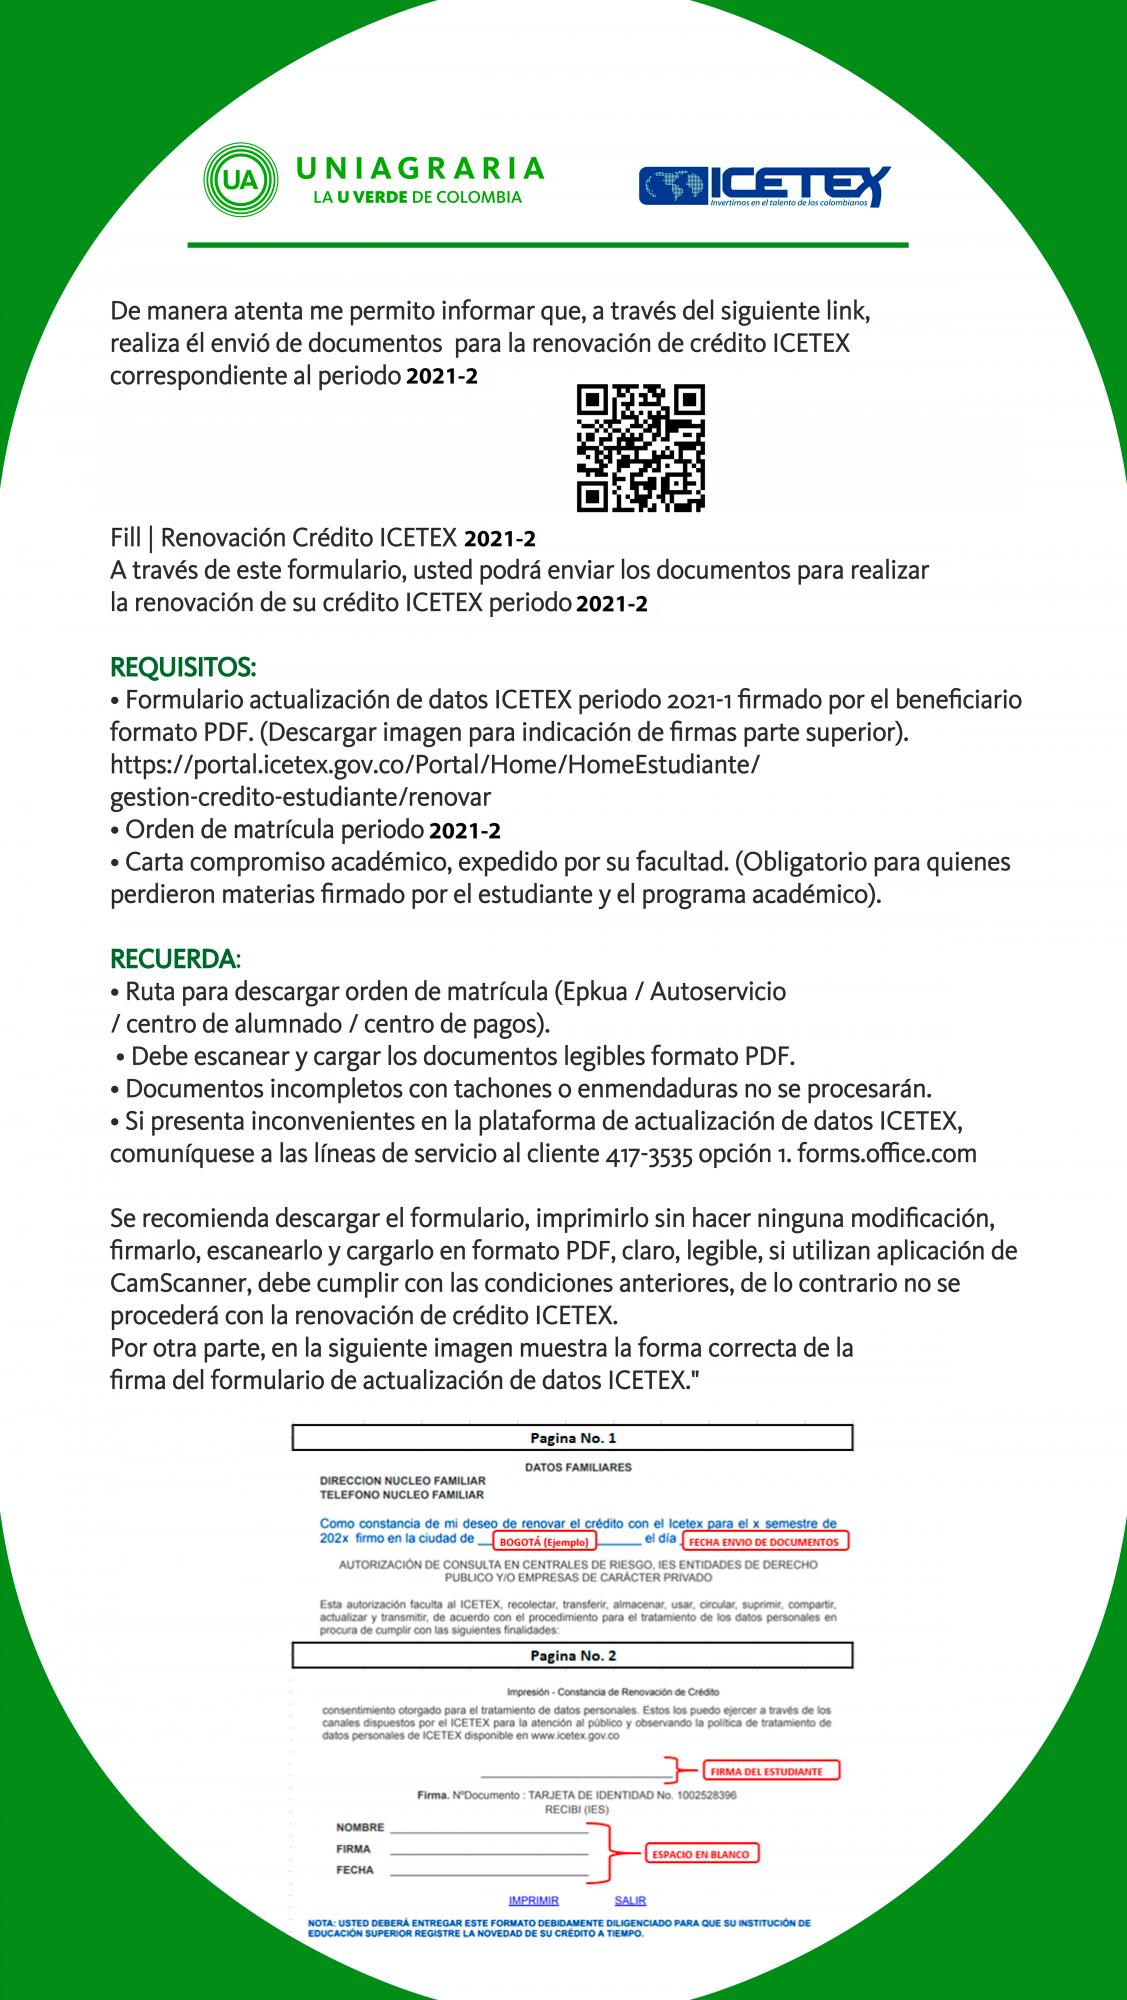 Renovación crédito ICETEX 2021-2